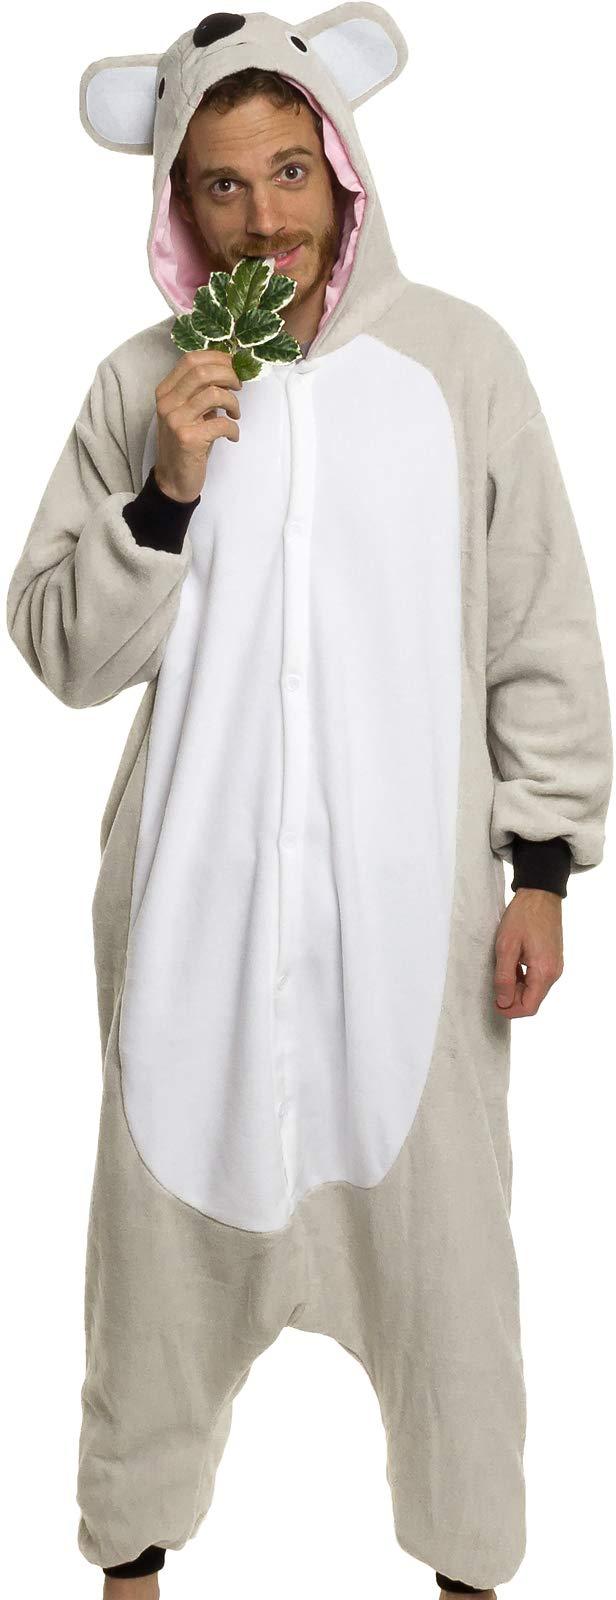 Silver Lilly Unisex Adult Pajamas - Plush One Piece Cosplay Koala Animal Costume